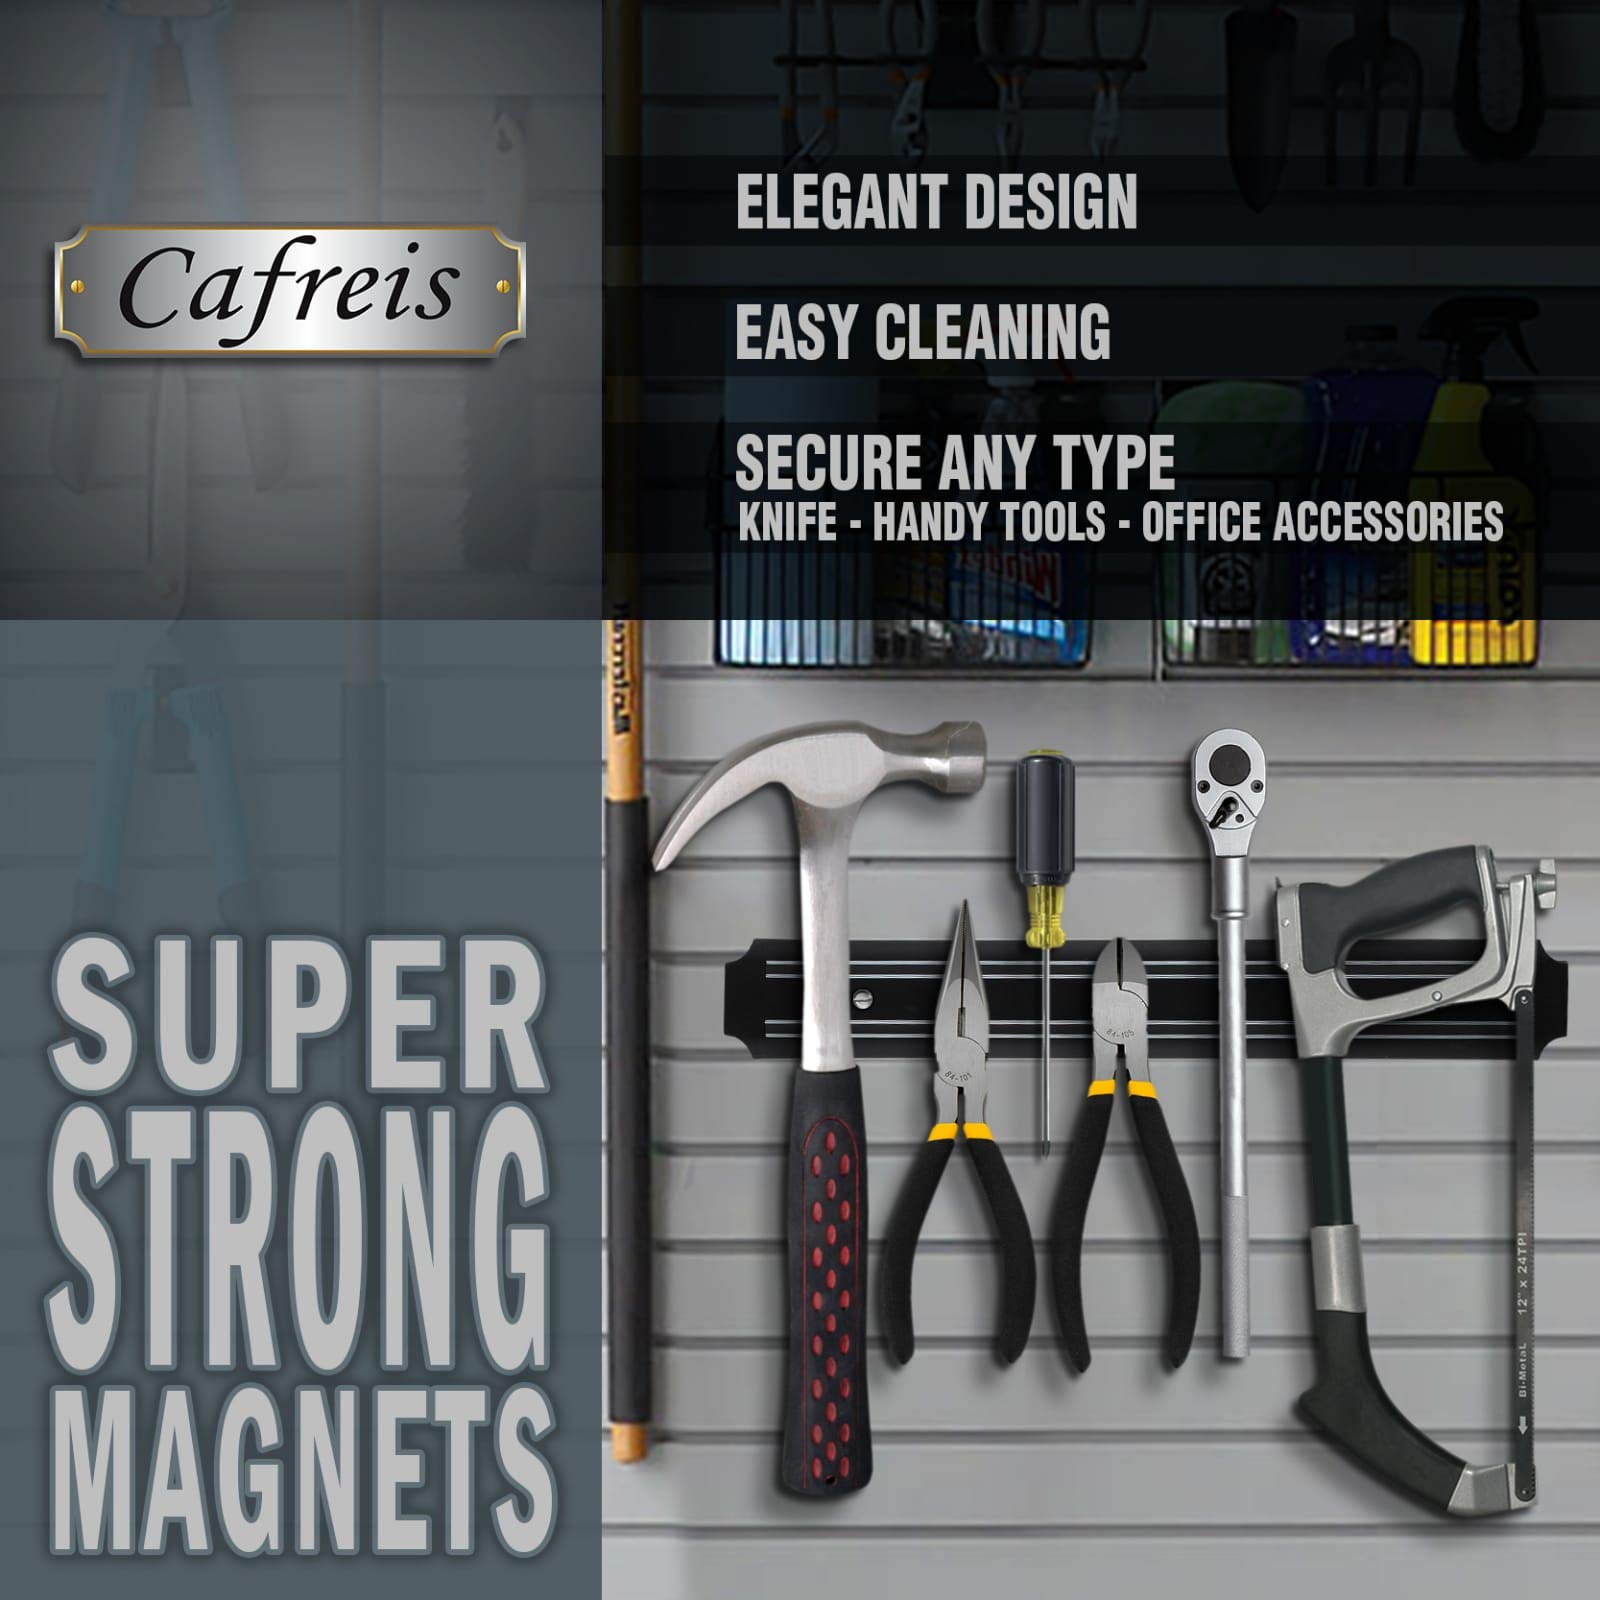 MAGNETO, 13 Inch Plastic Magnetic Knife bar, Knife Holder bar, Magnetic Storage Rack Strip, Magnetic Tool Organizer by Cafreis (Image #6)